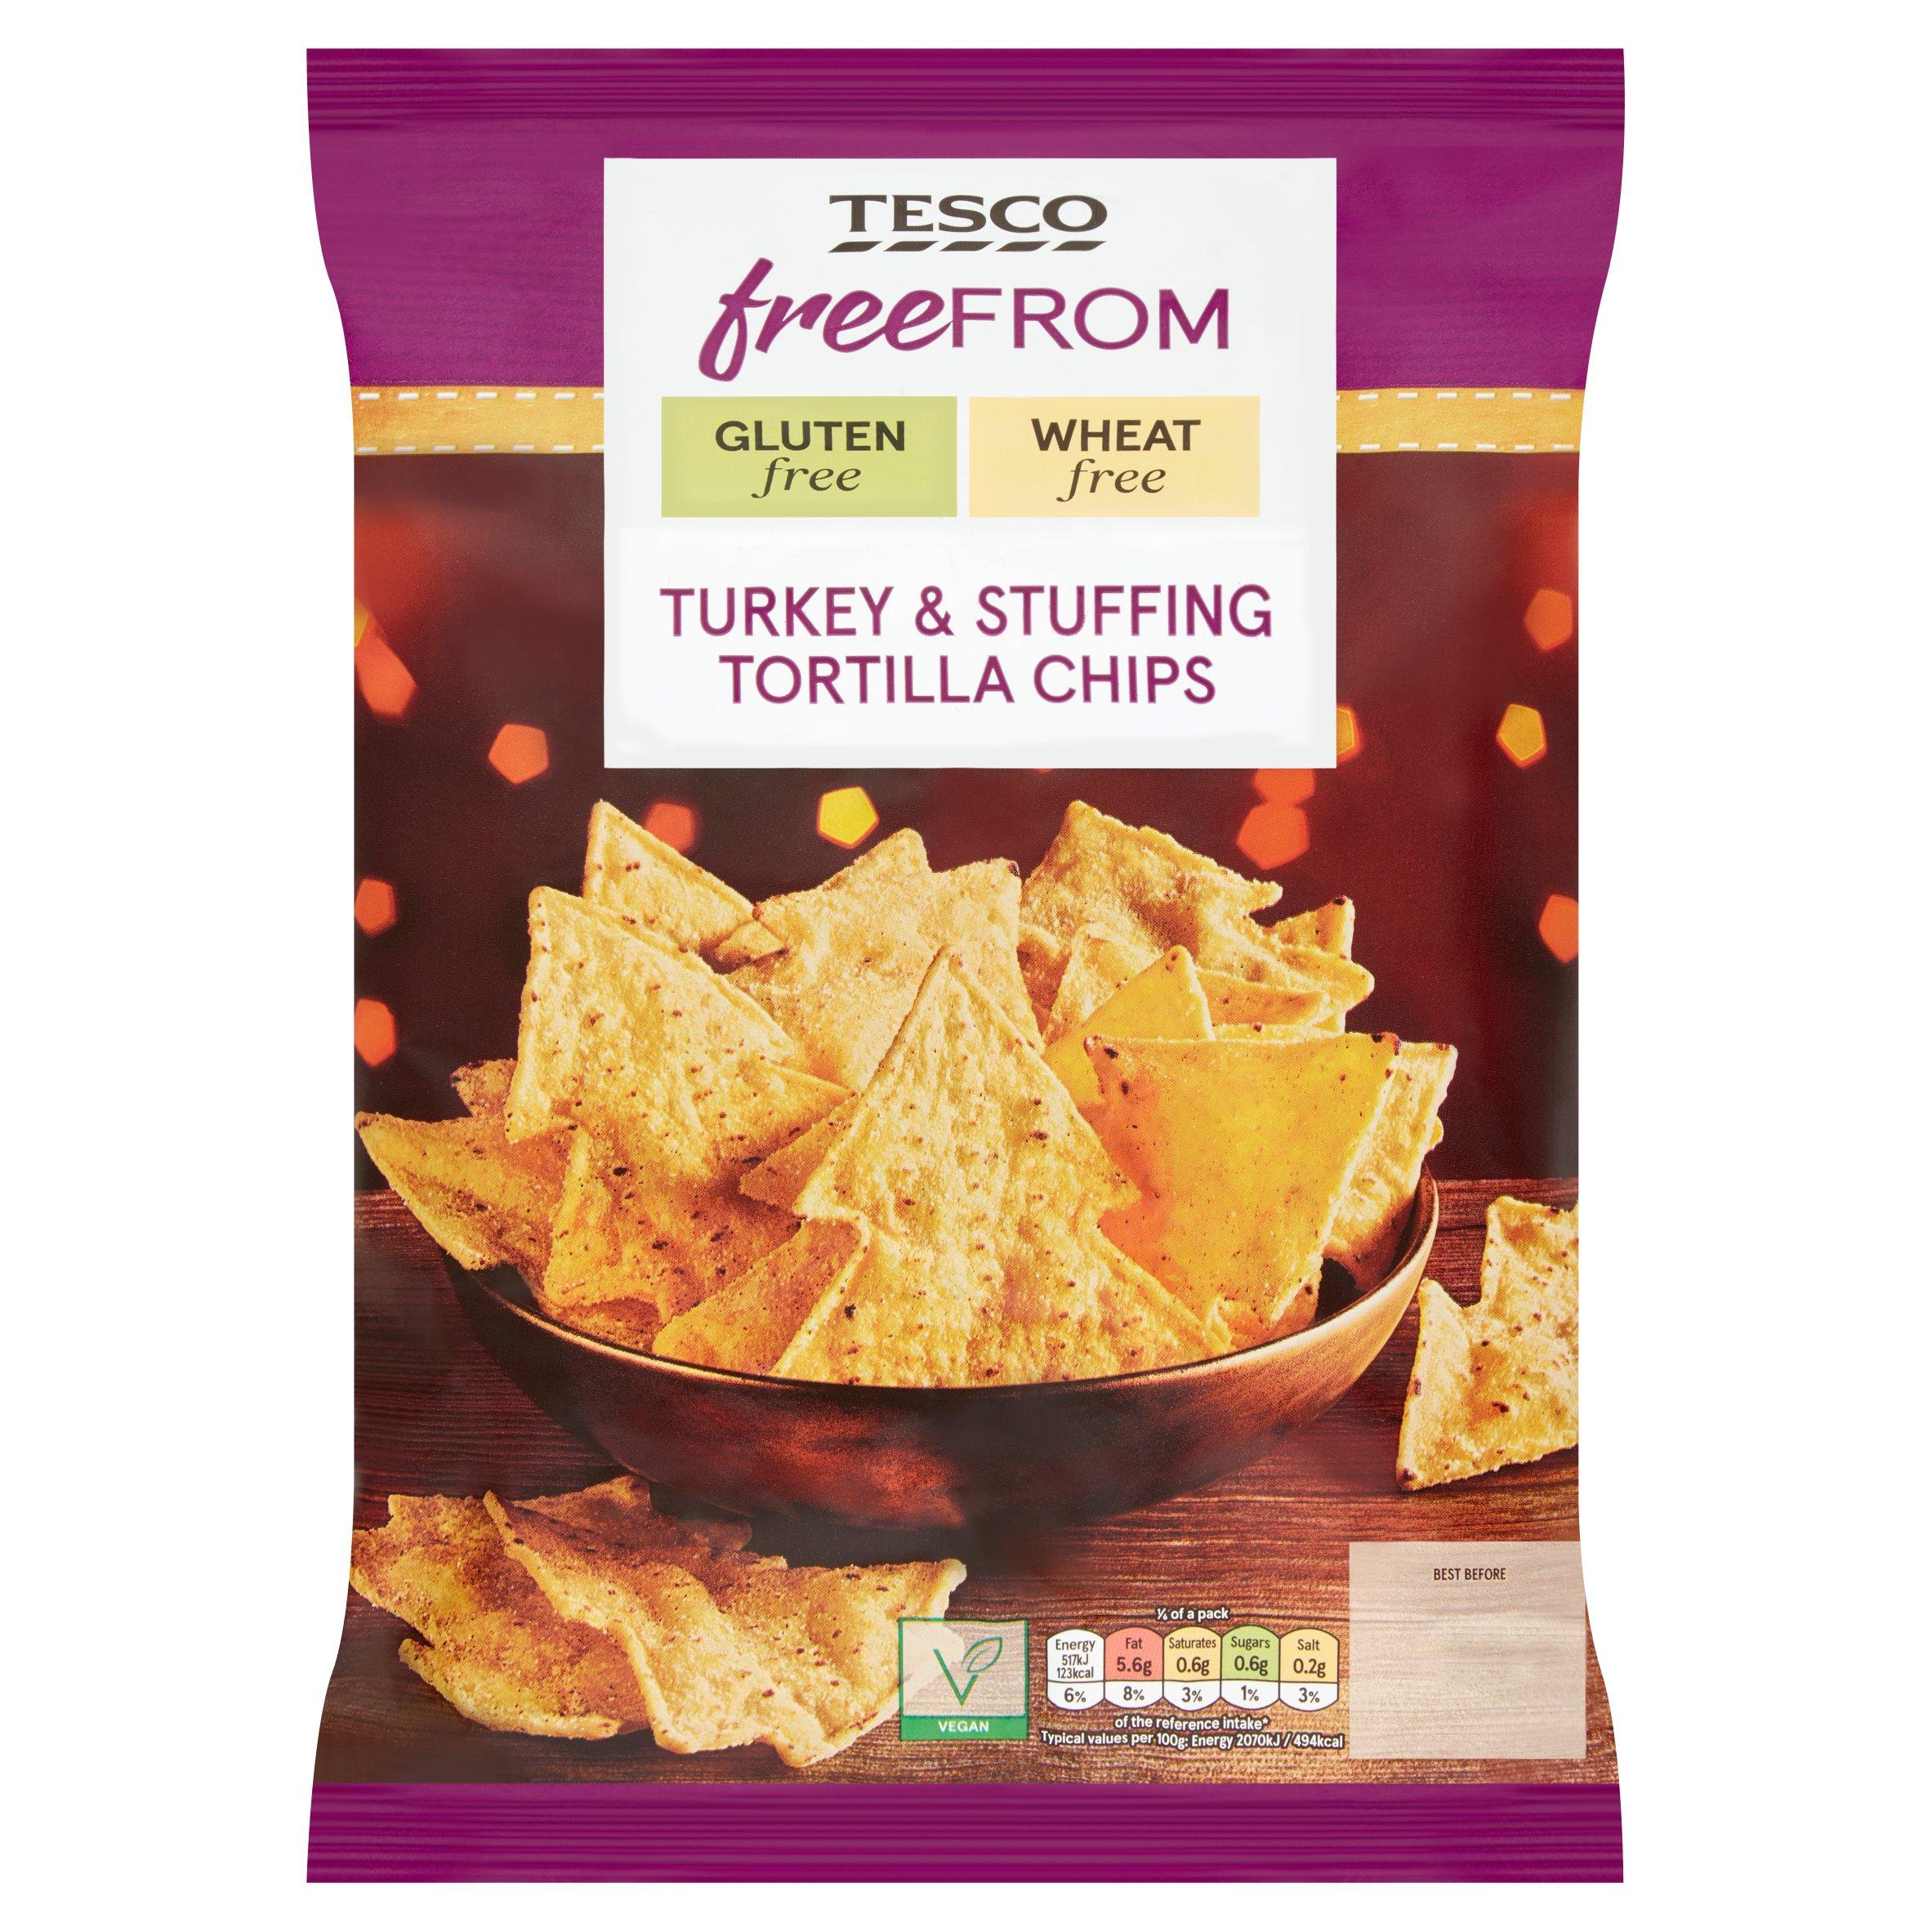 Tesco Free From Turkey & Stuffing Tortilla Chips 150G